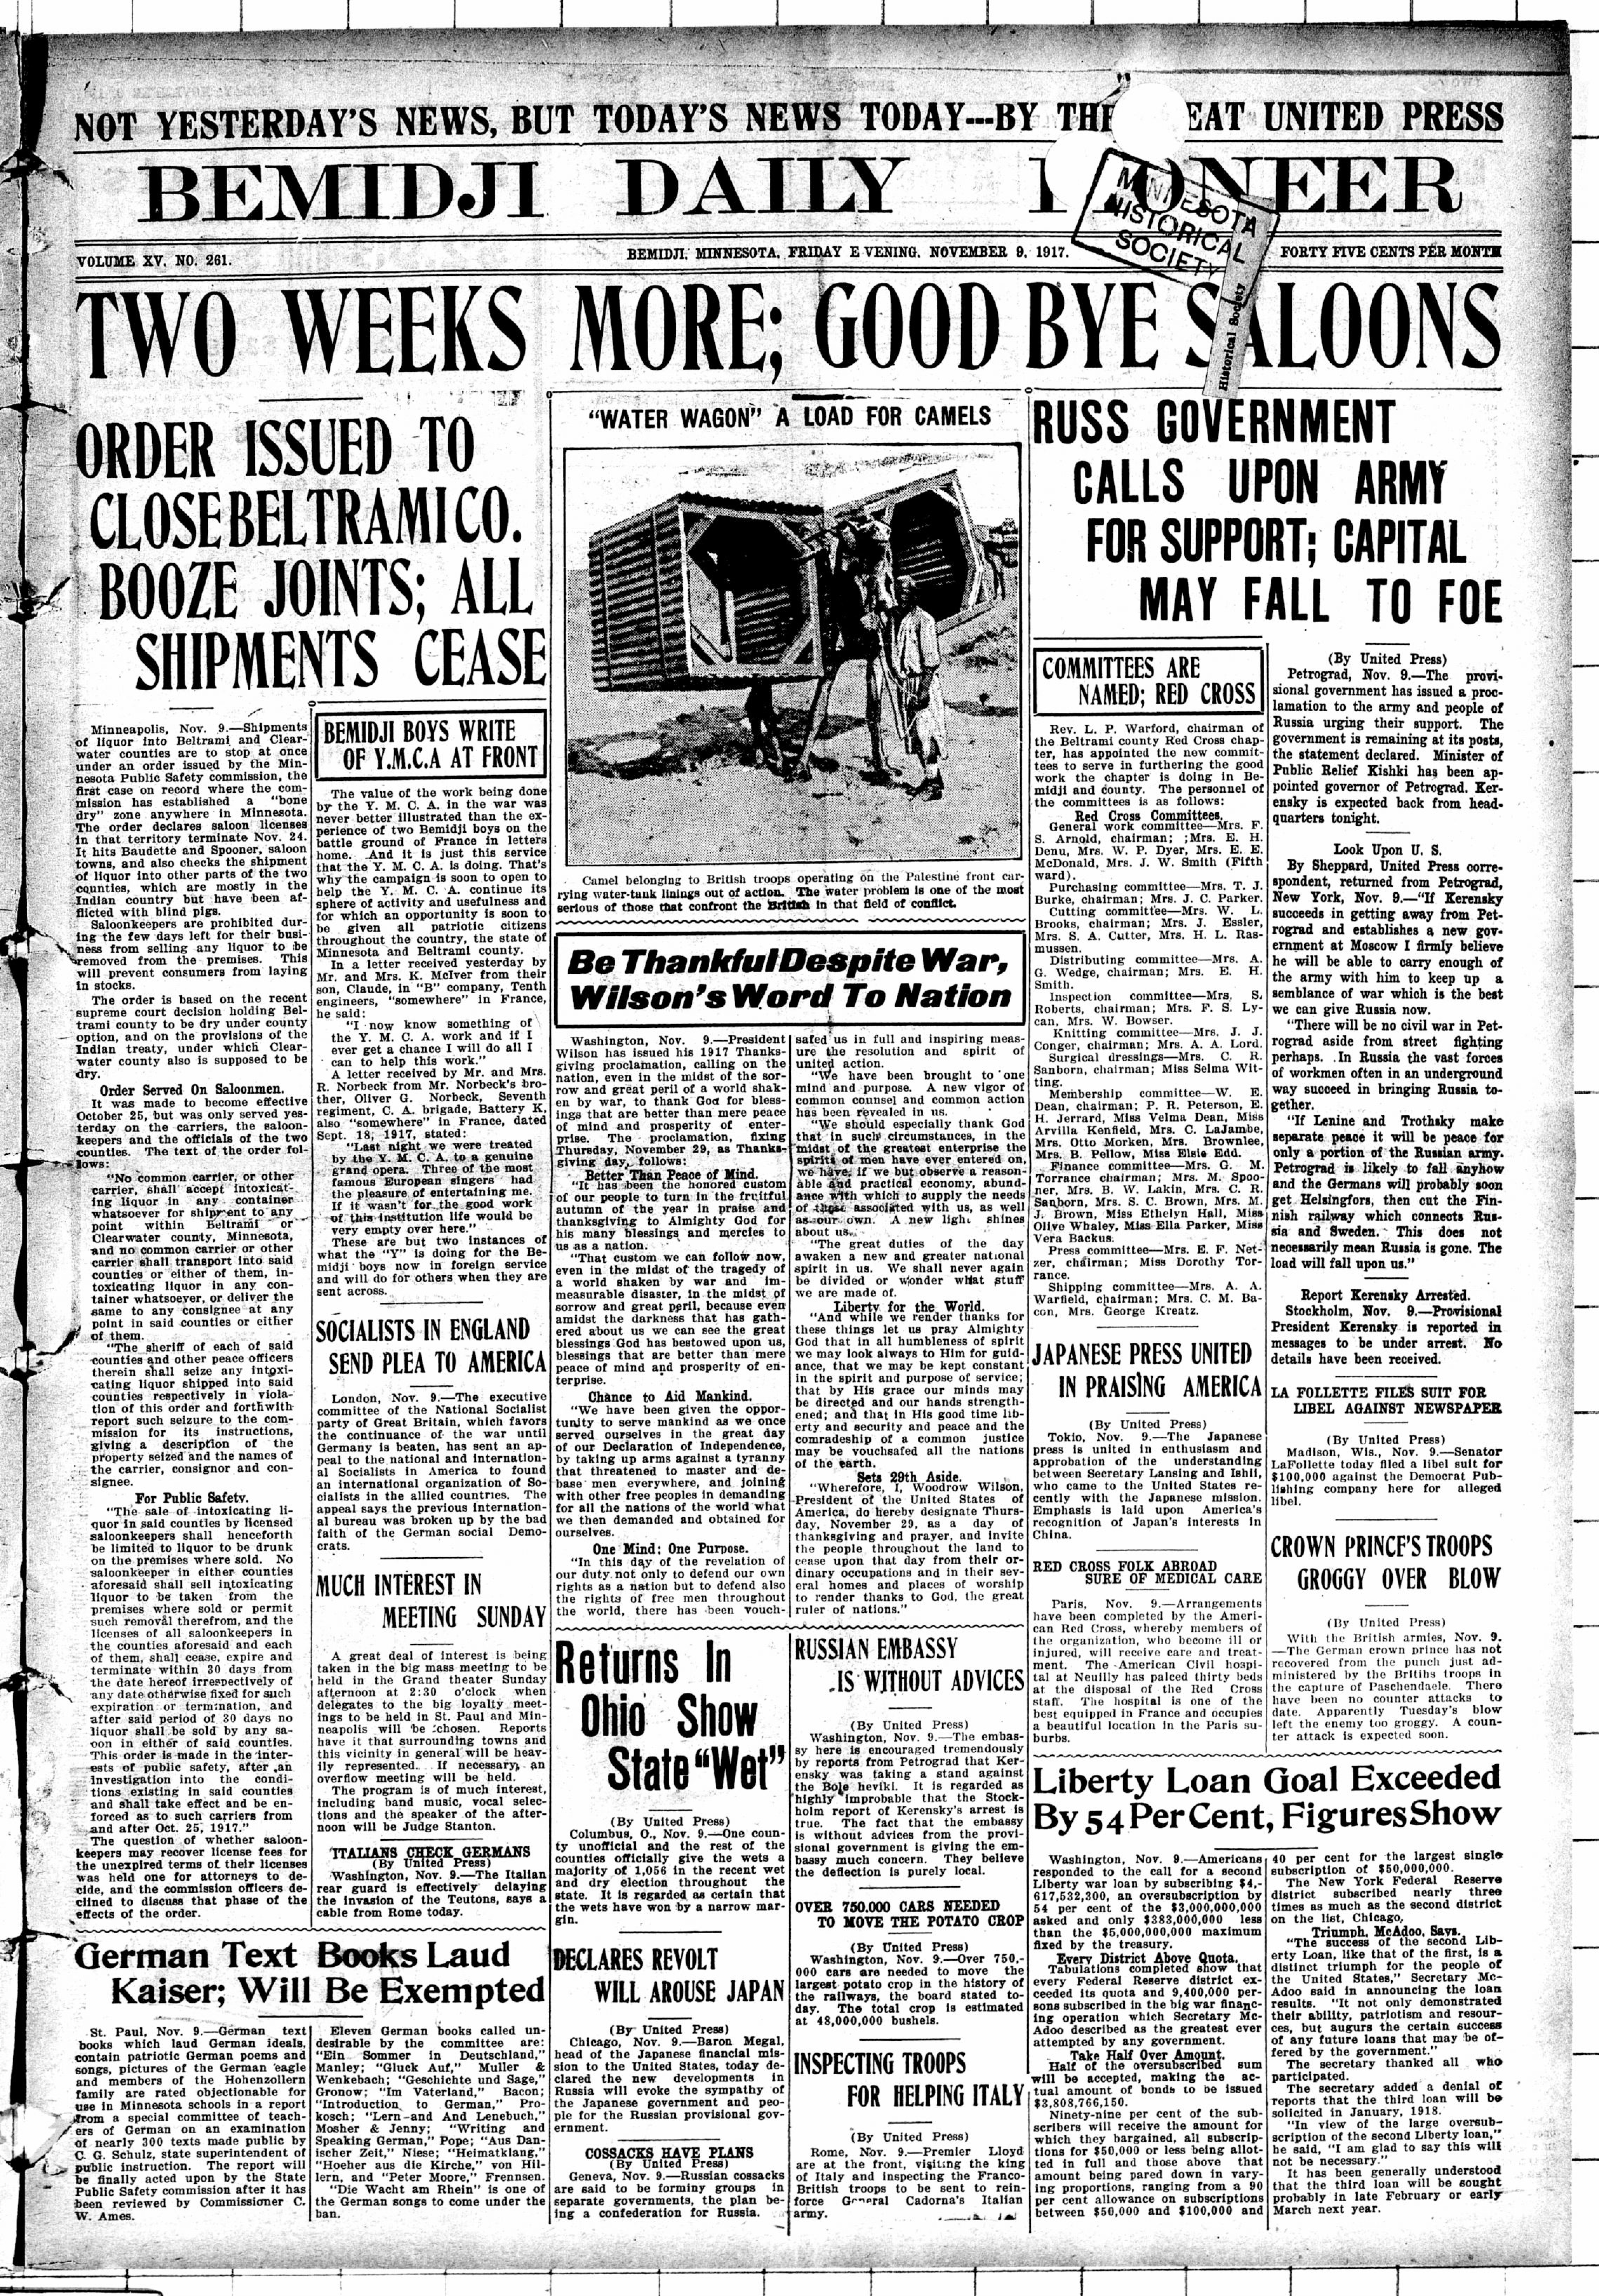 The Bemidji Daily Pioneer. (Bemidji, Minn.), Nov. 9, 1917. Front page news: Counties in Minnesota instituting prohibition.